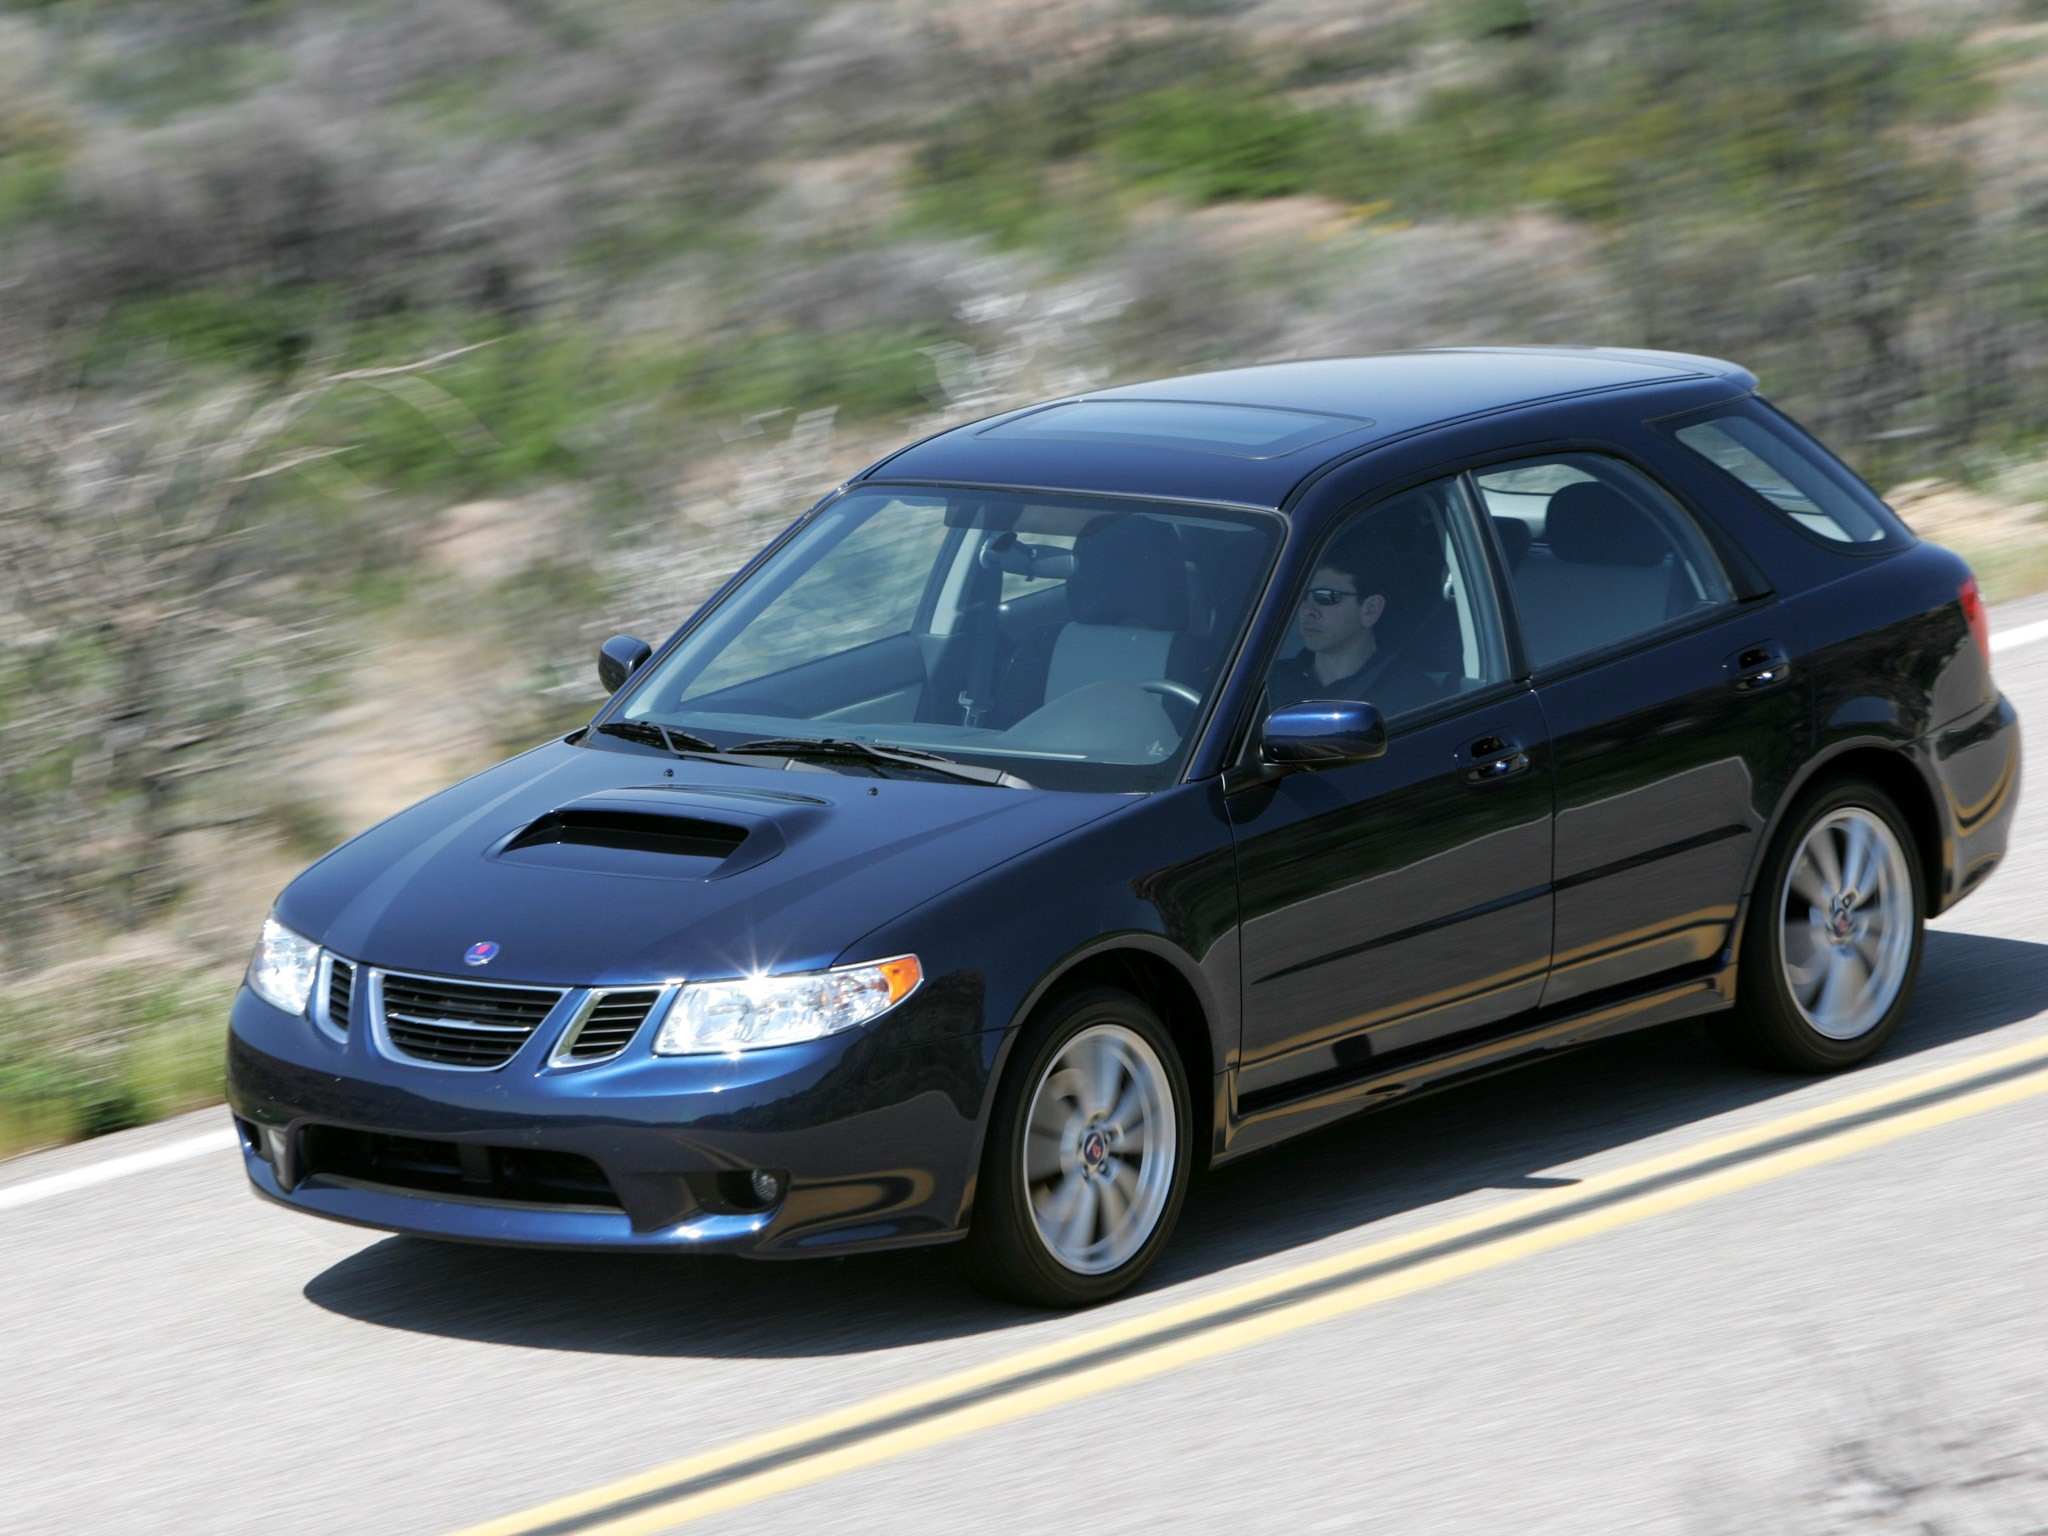 Green Auto Sales >> SAAB 9-2X specs - 2004, 2005, 2006 - autoevolution